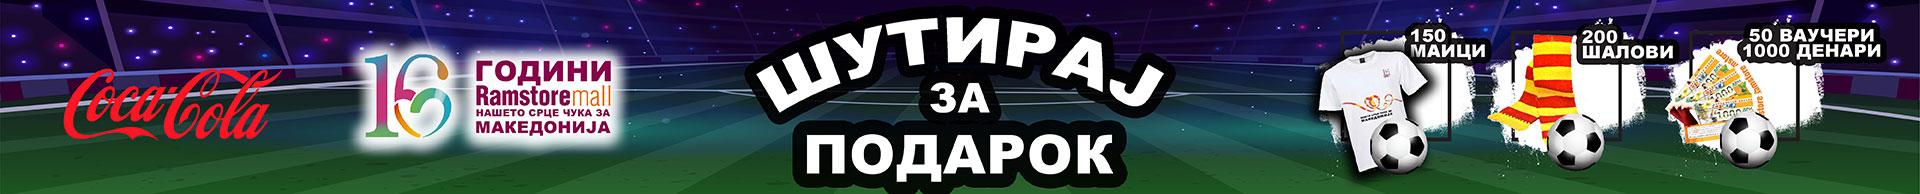 Web-banner---GS